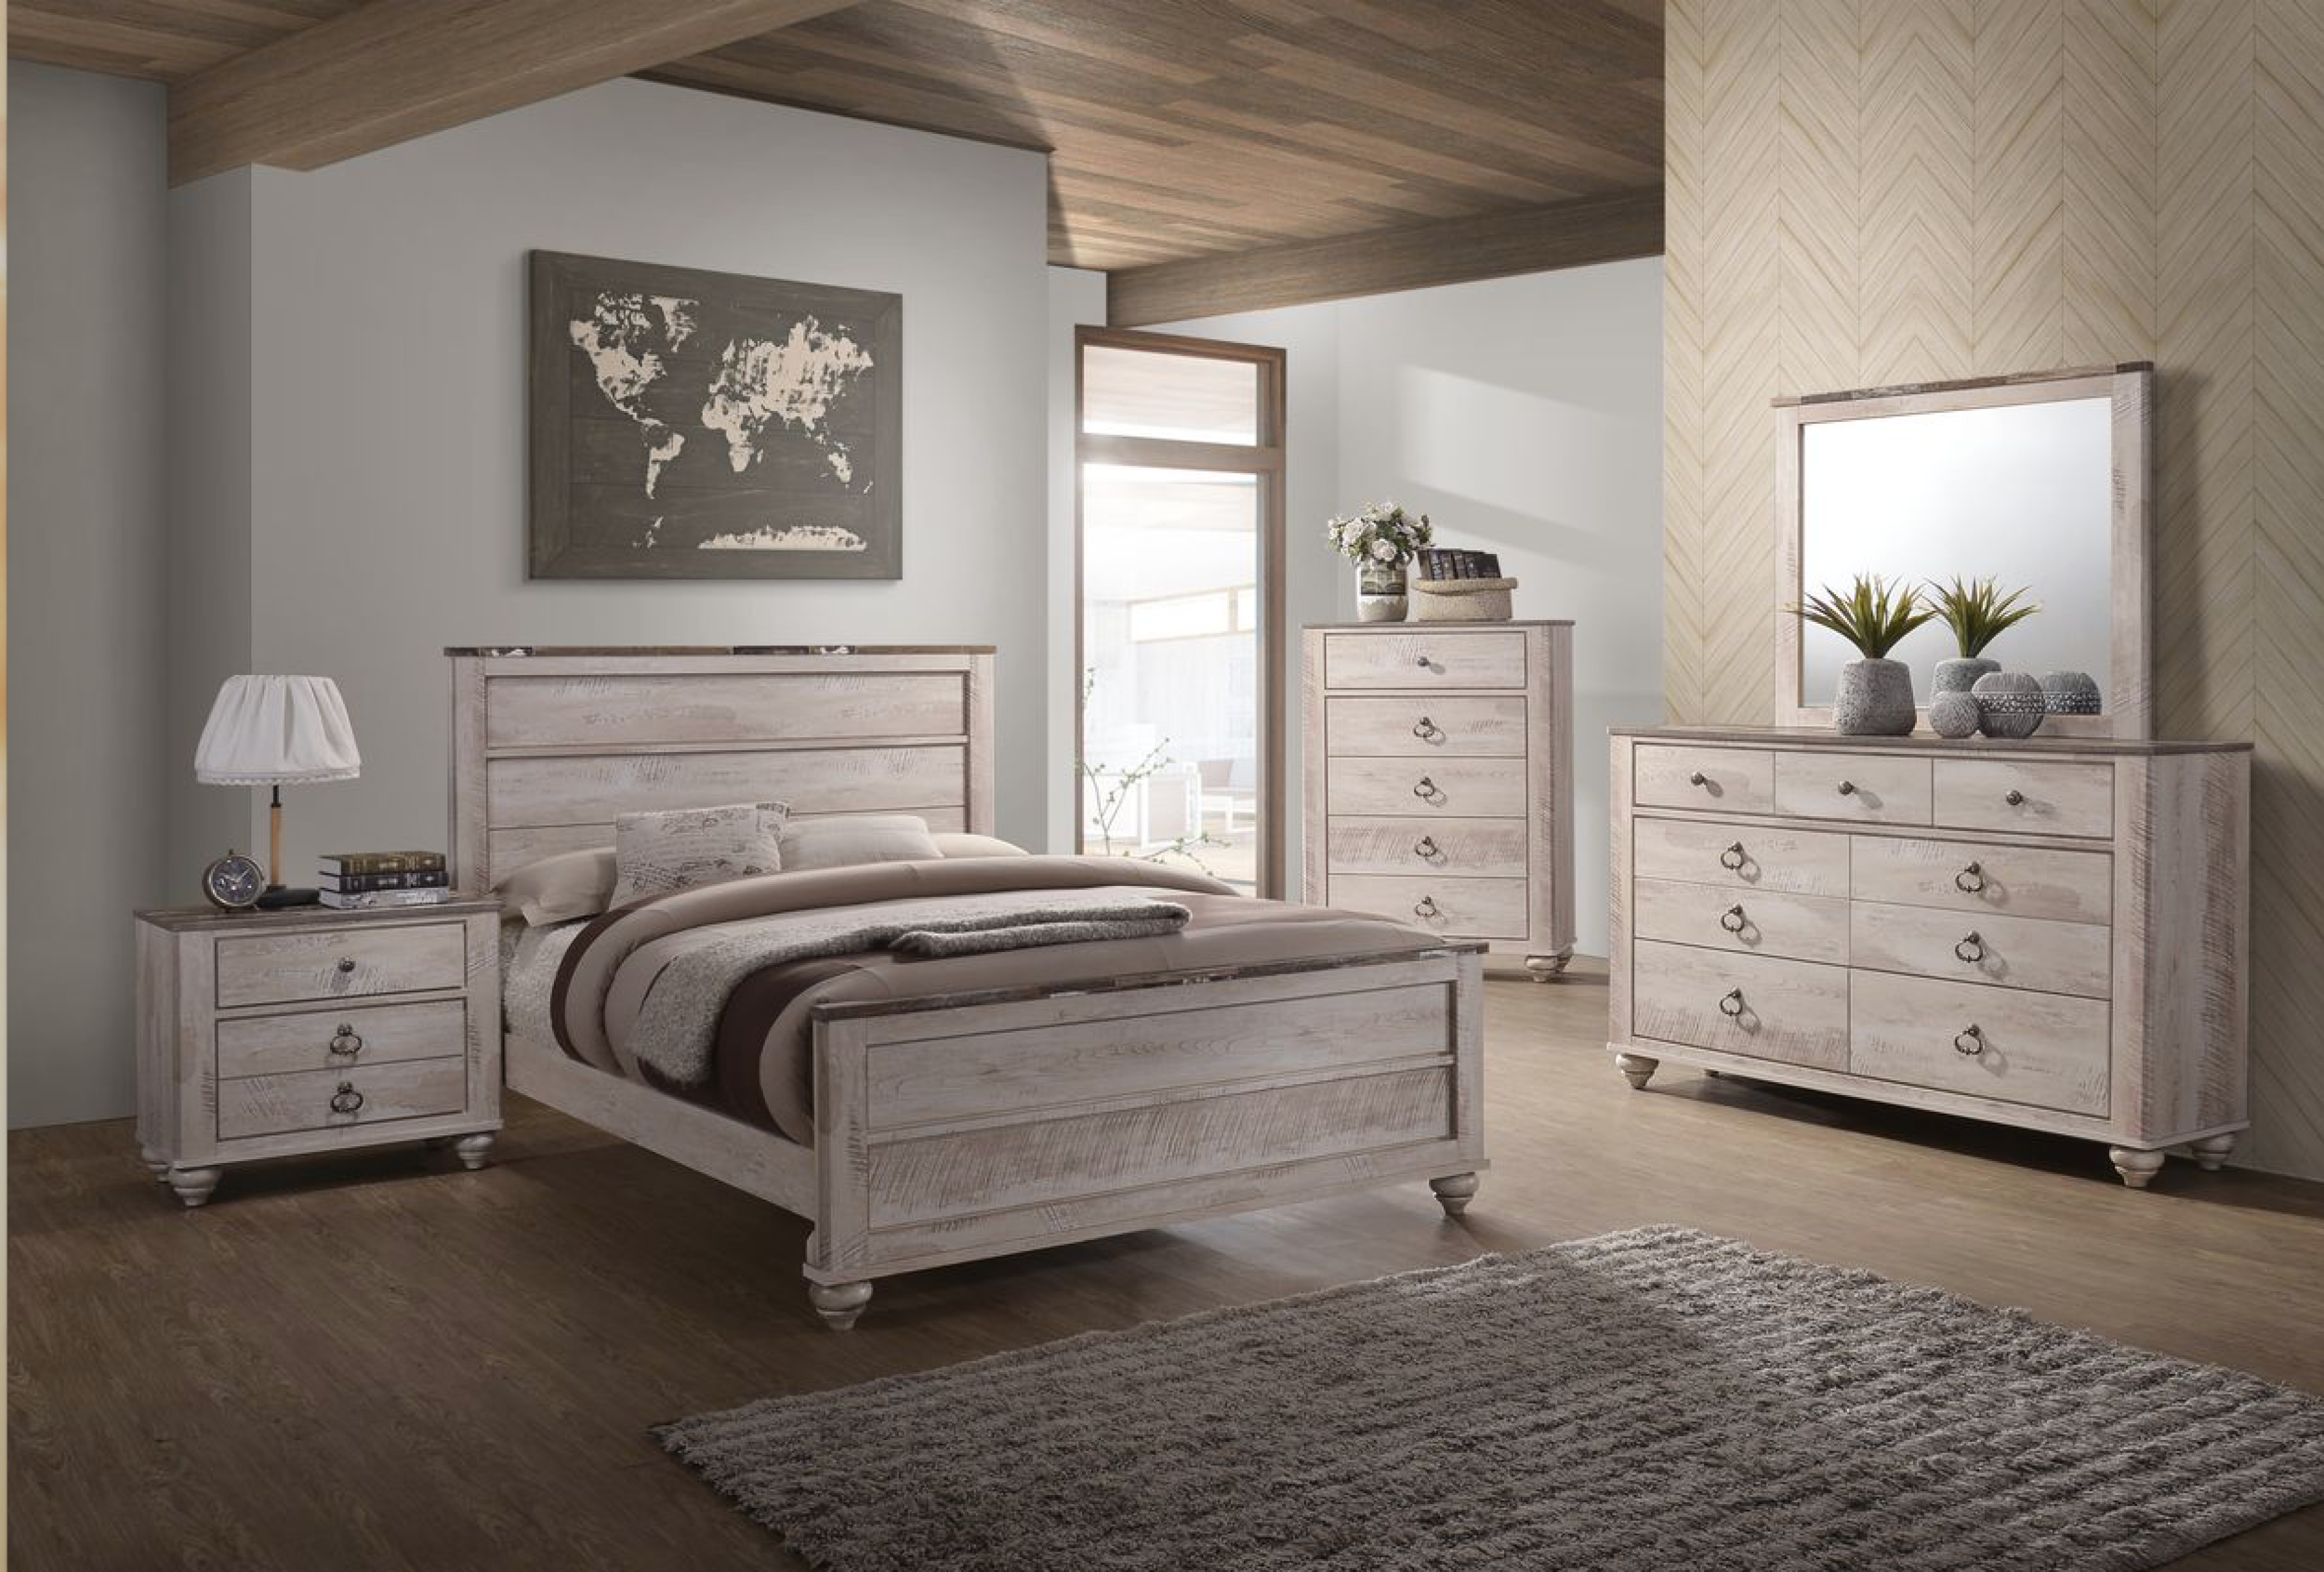 Bedroom Discount Furniture Warehouse Furniture